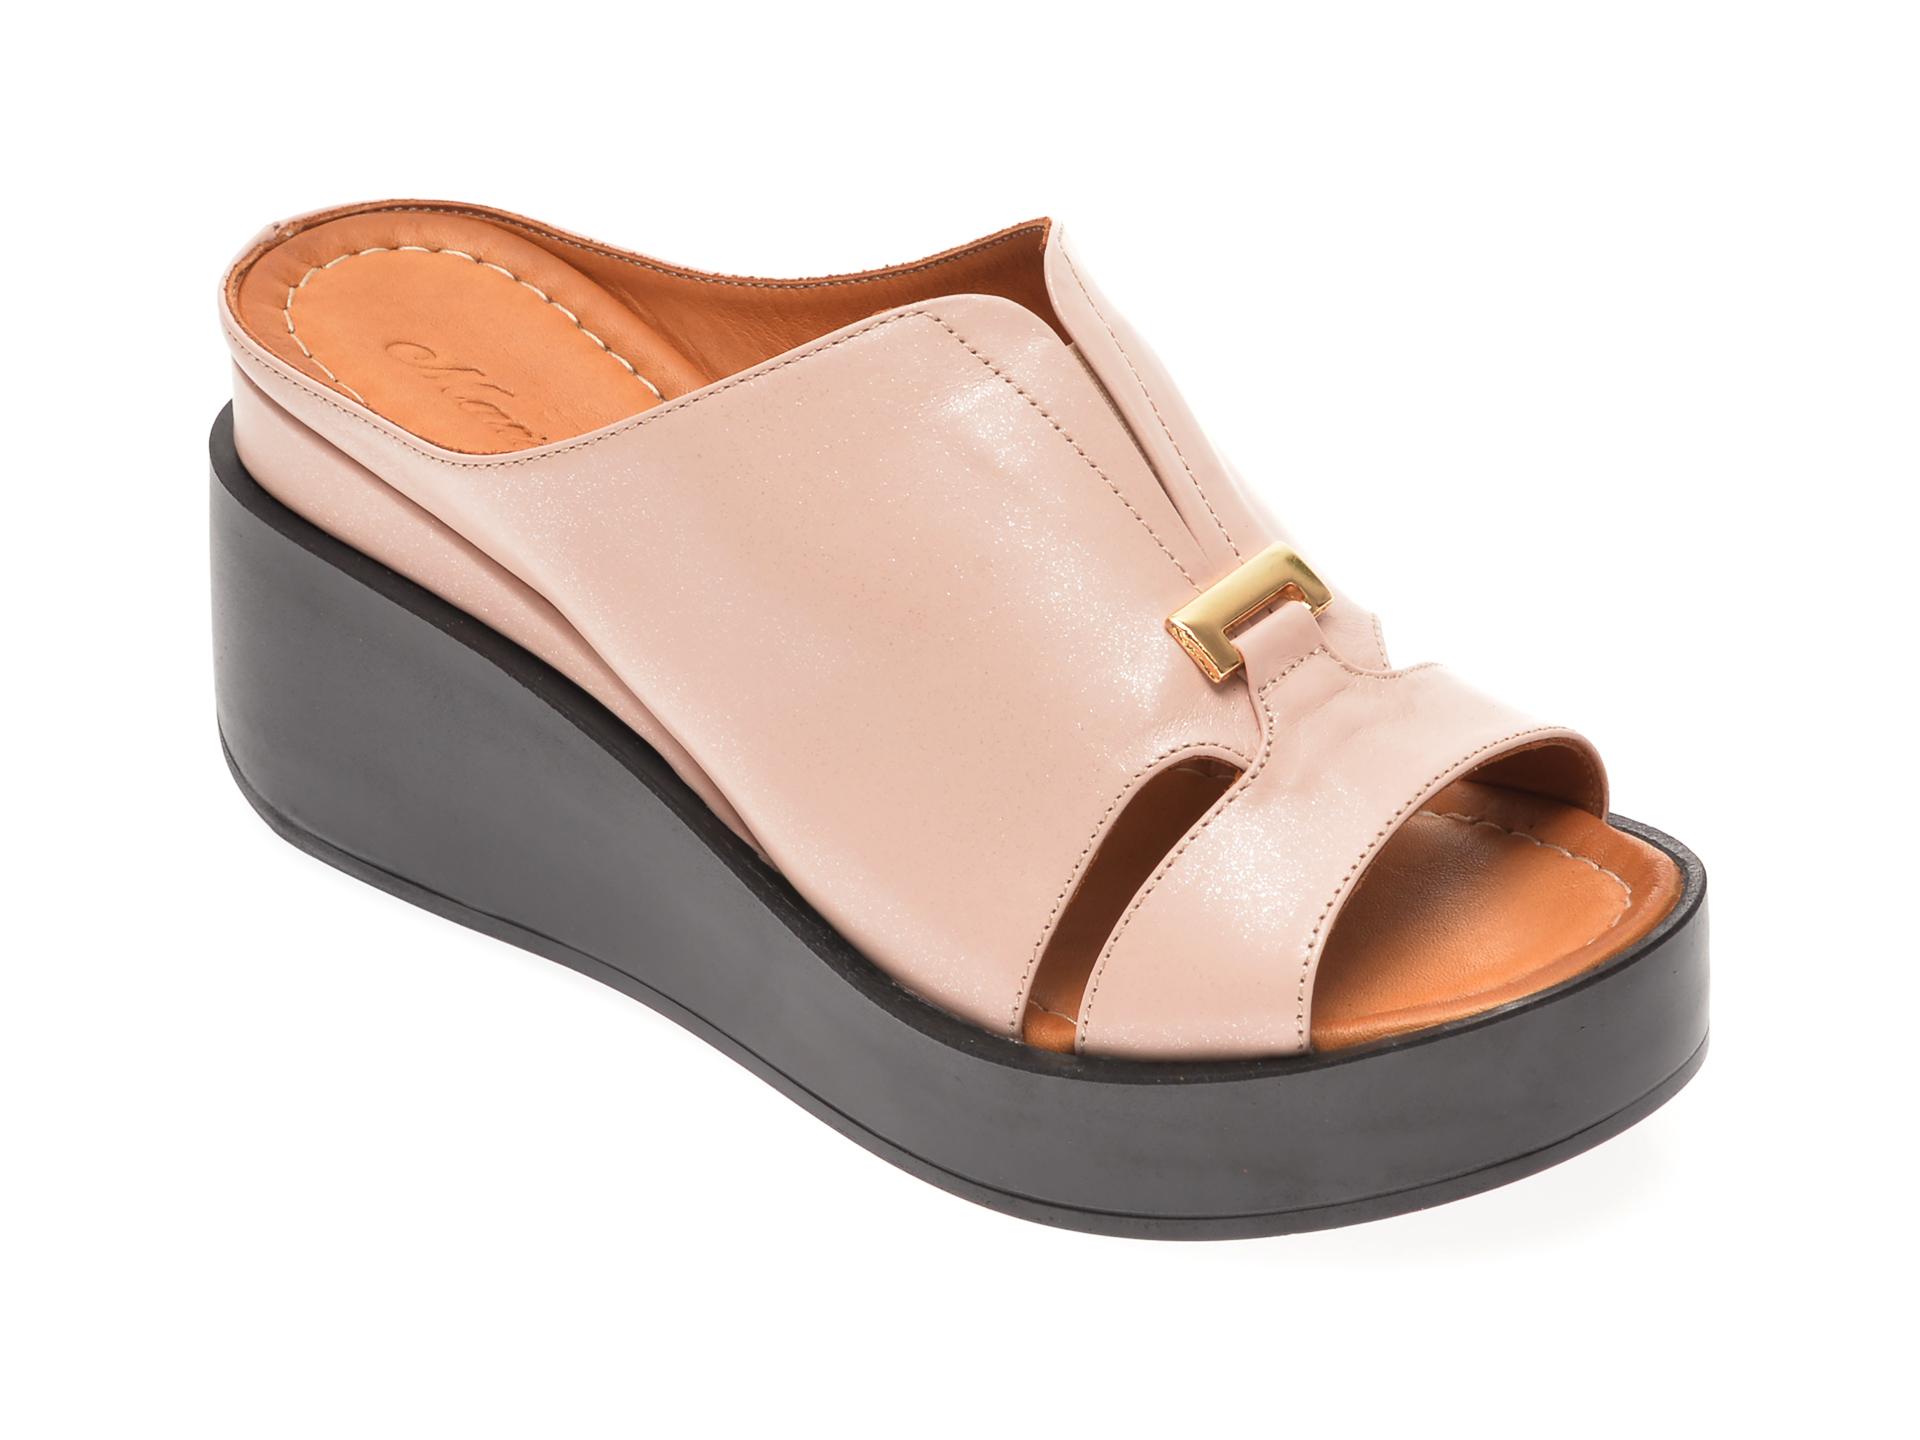 Papuci MISS LIZA roz, 118907, din piele naturala